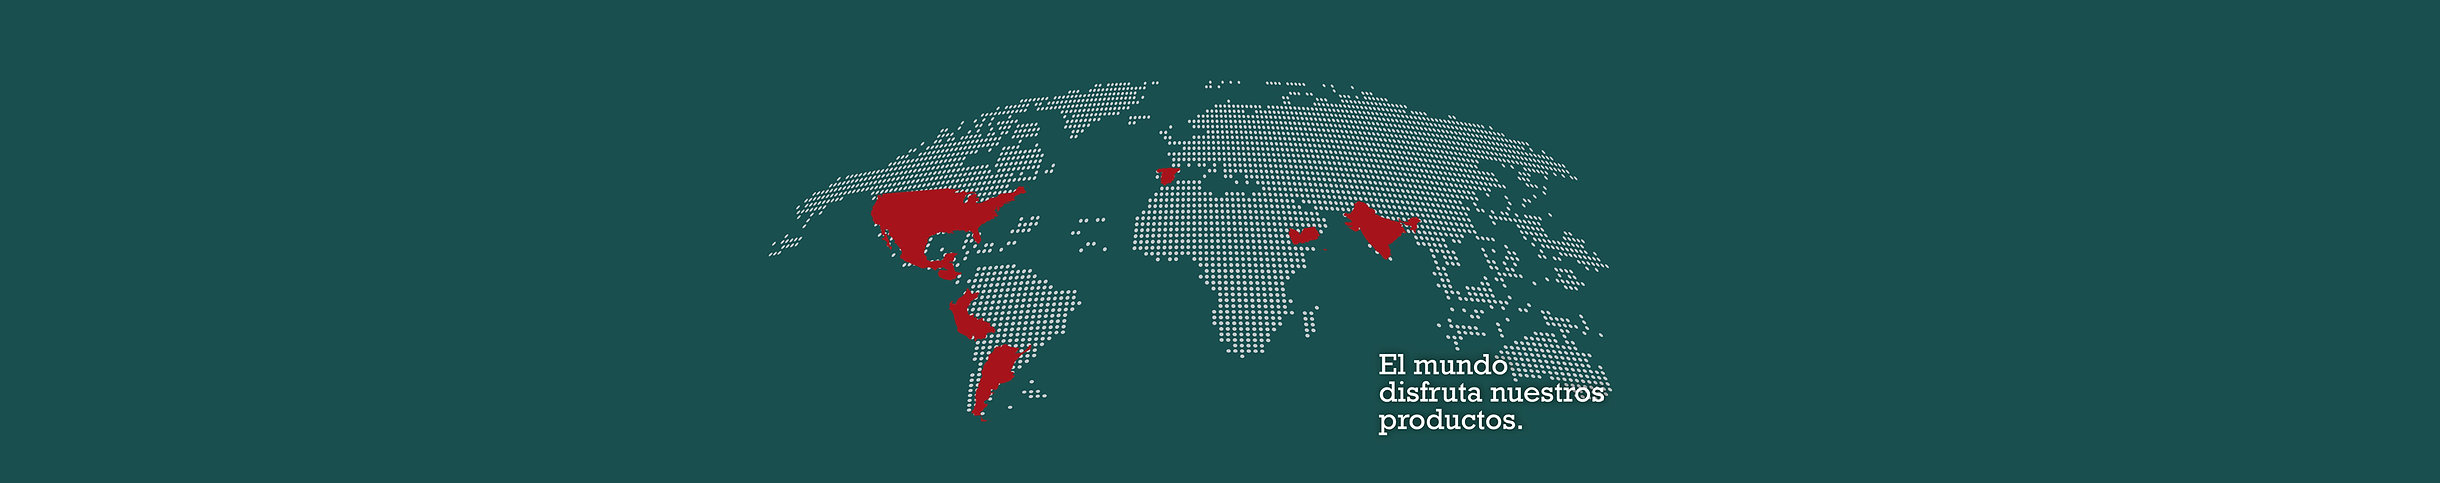 mapa_mundo2020.jpg